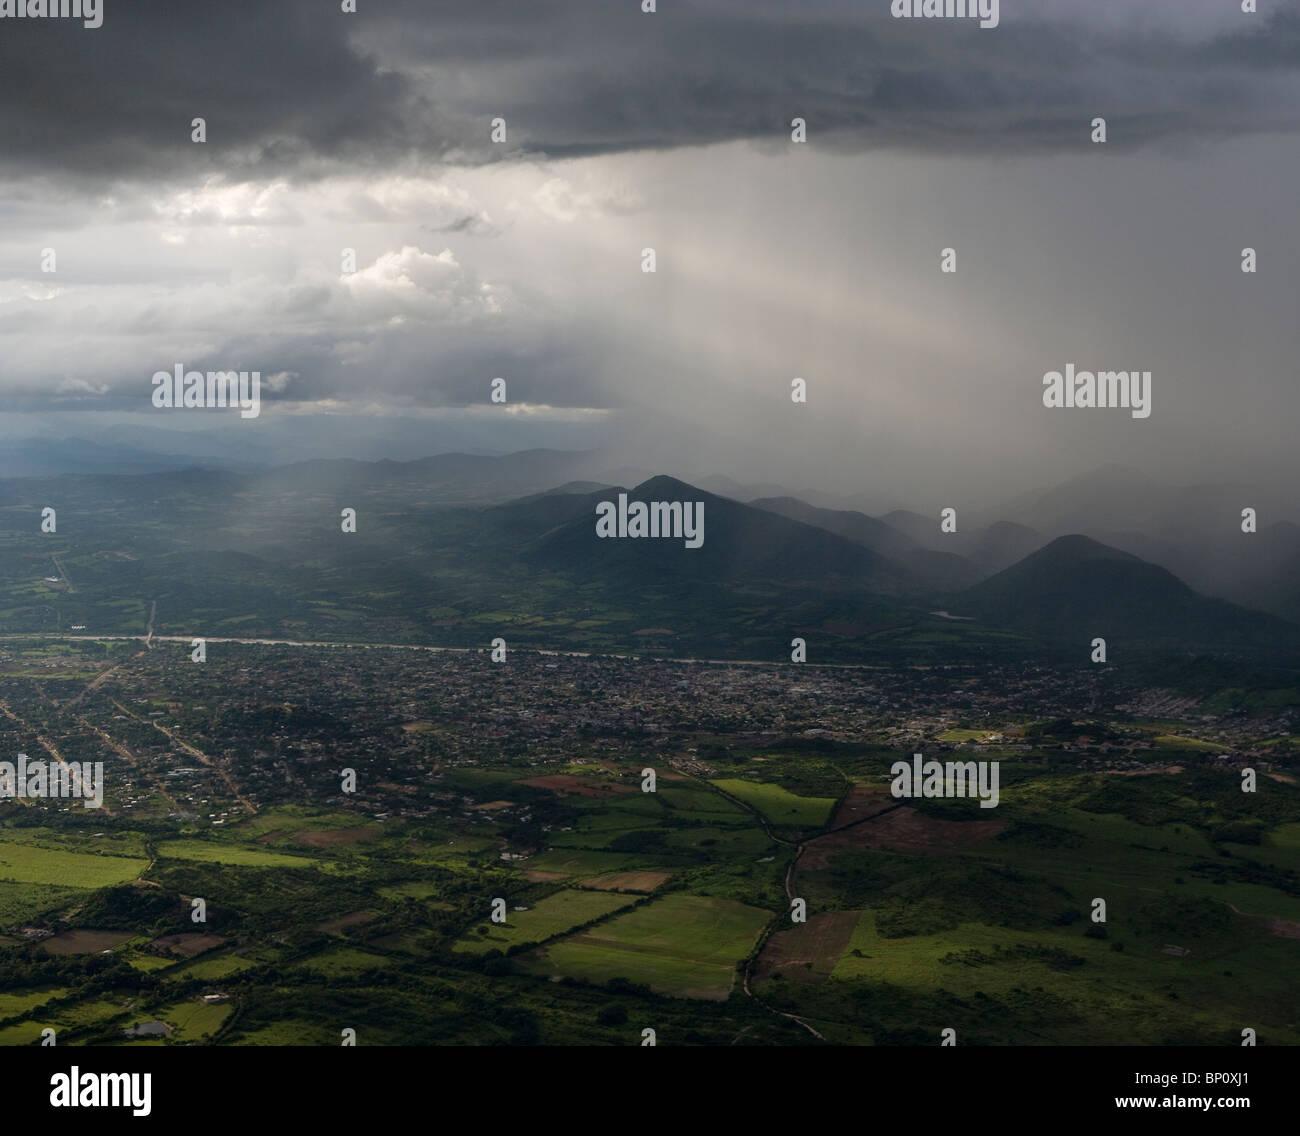 aerial view above rain showers rays of sunlight near Tuxtla Gutierrez Chiapas Mexico - Stock Image